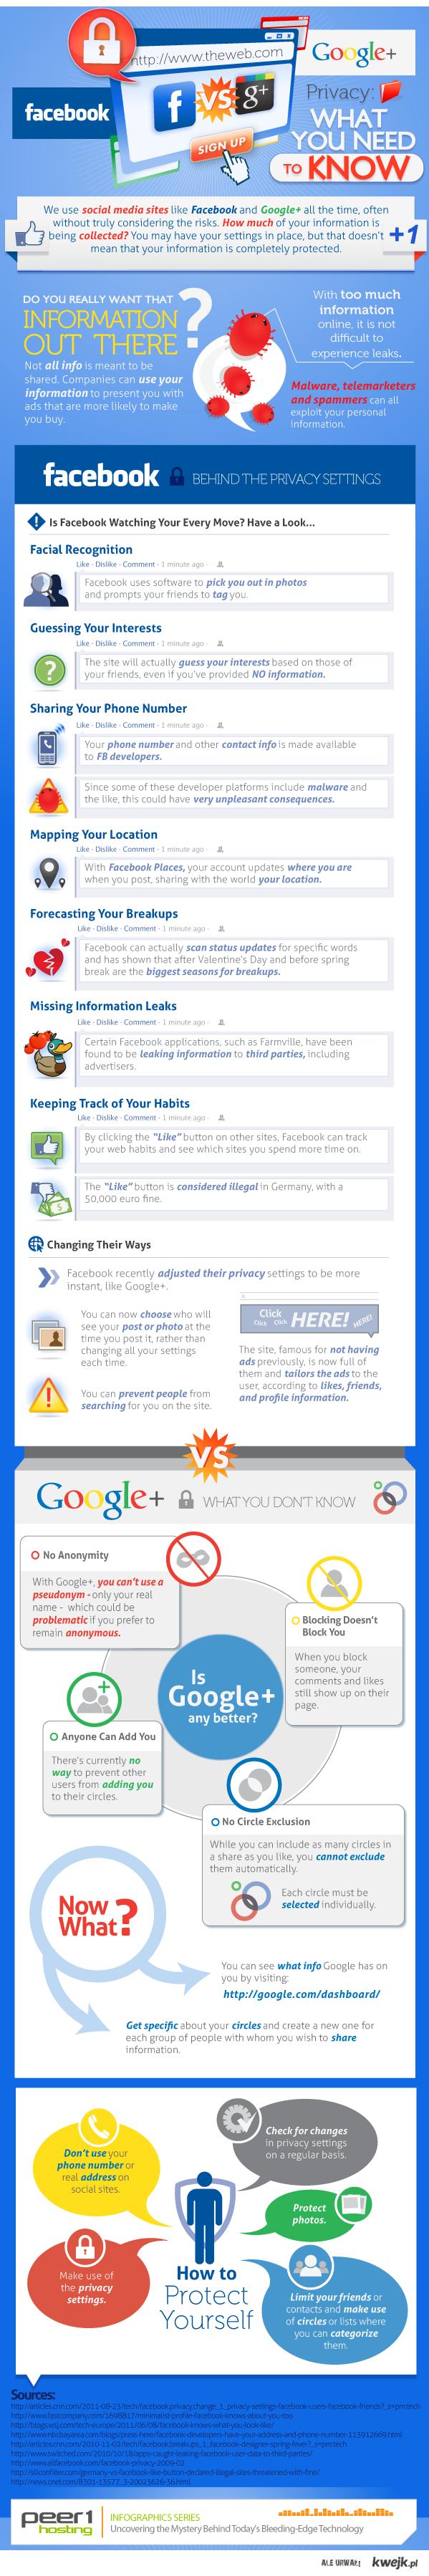 Prywatność: Facebook vs Google